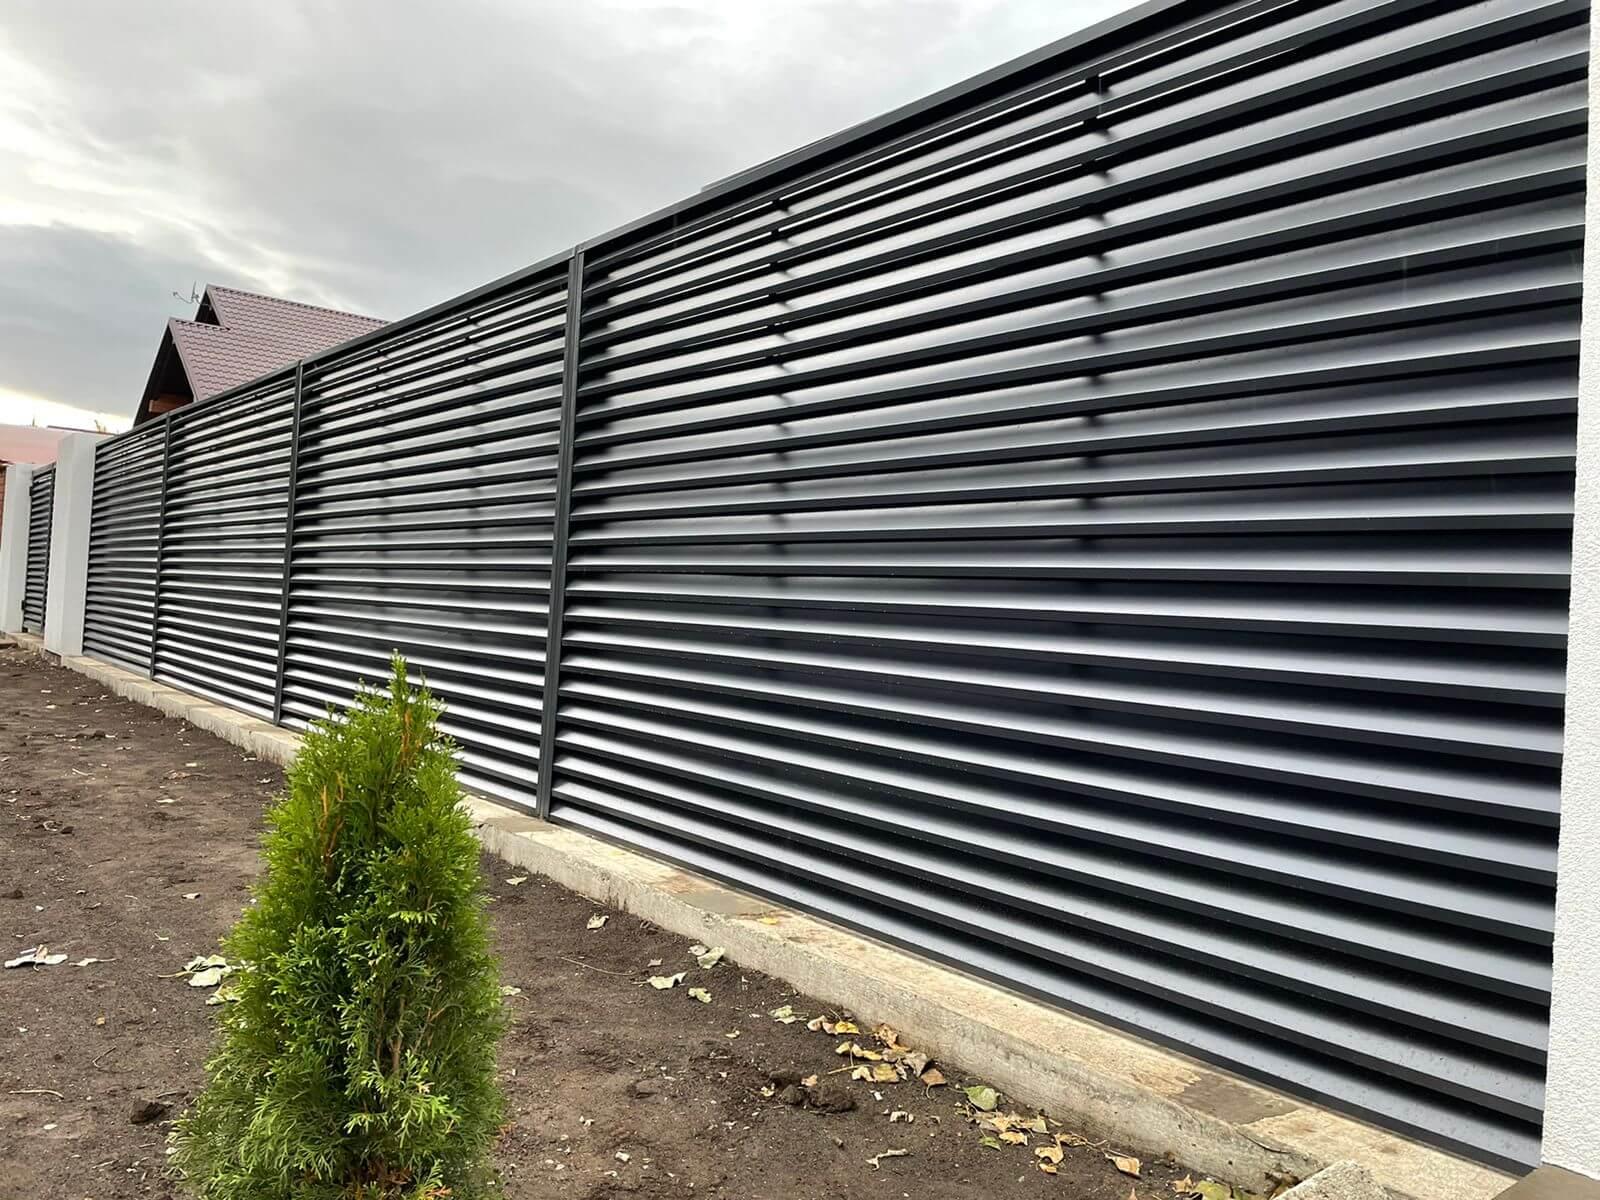 забор-жалюзи с ламелями ЭКО-Z Серый Графит двухсторонний фото1